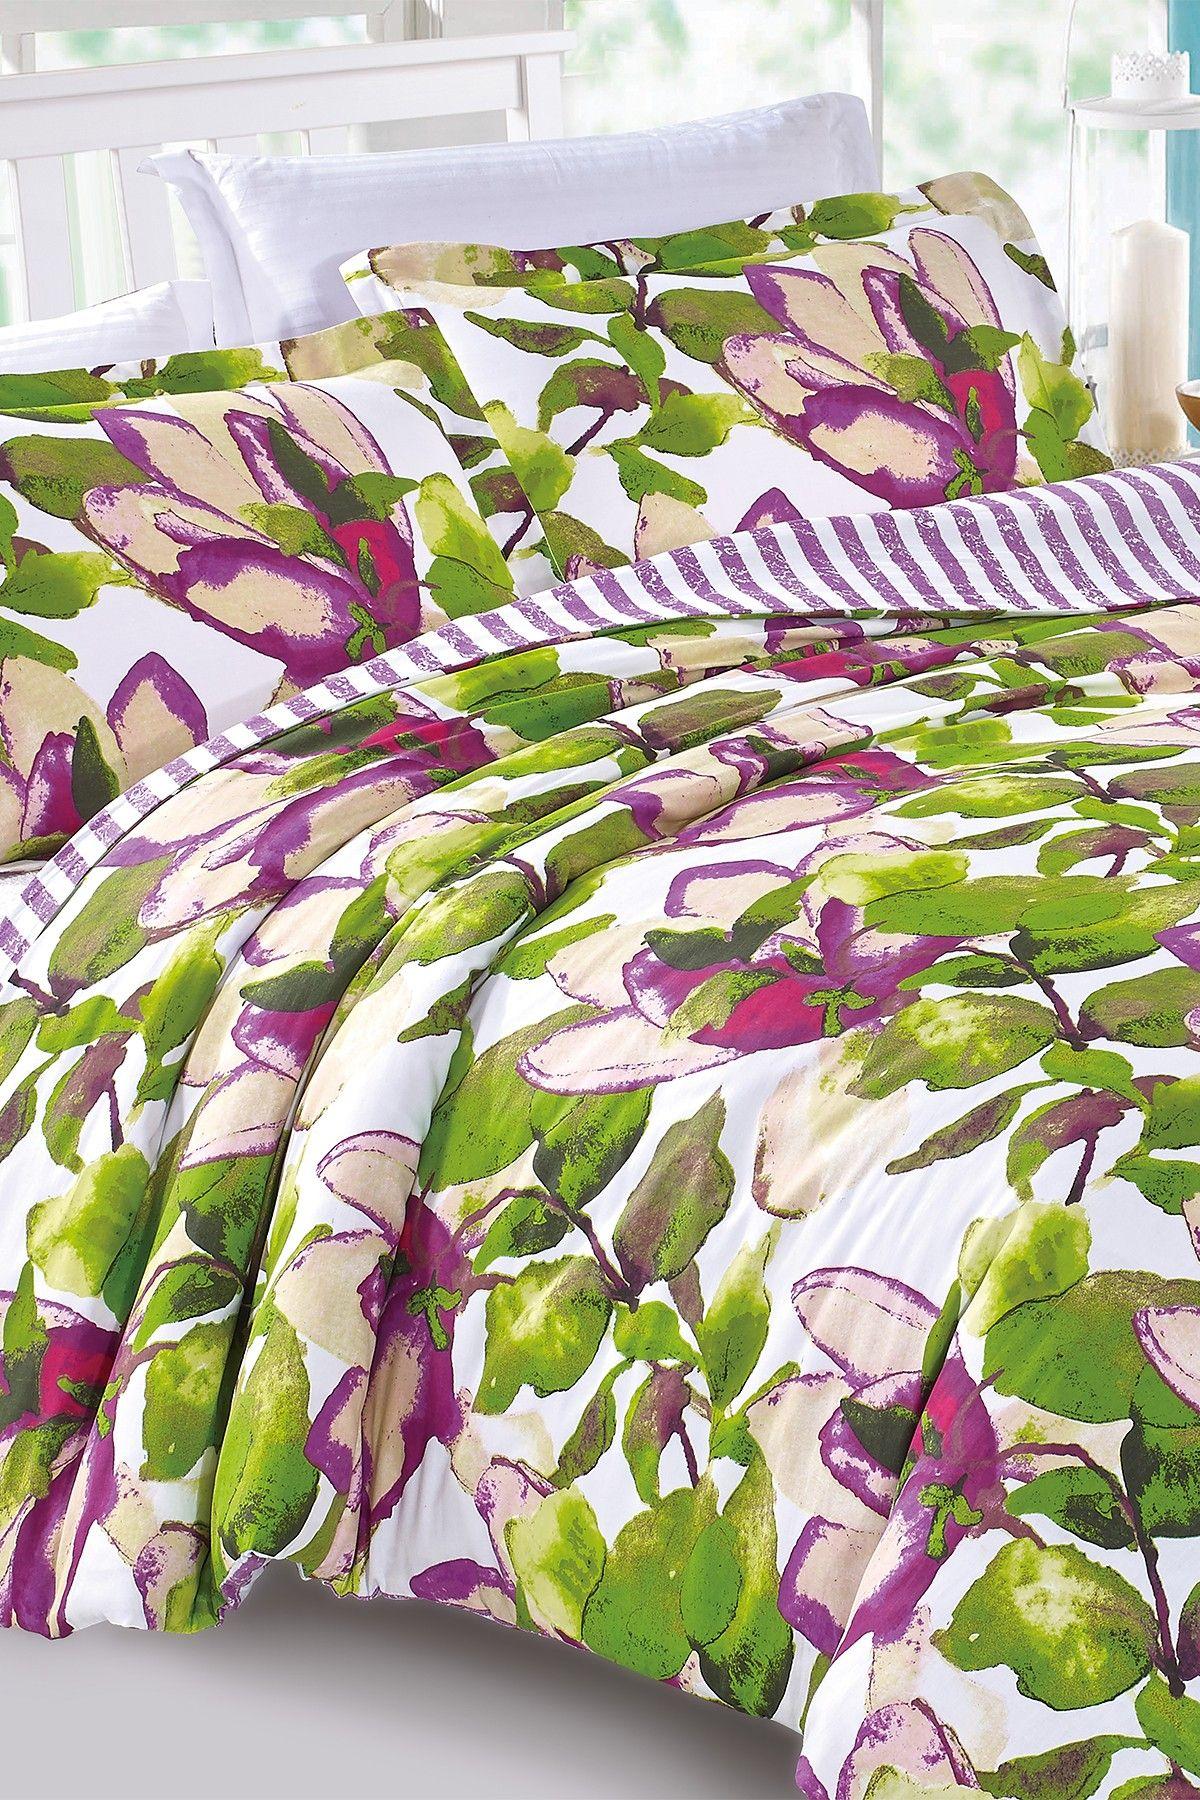 Floral Inspiration Full Queen Duvet Cover Set Multi By California Design Den Duvet Cover Sets King Duvet Cover Sets Queen Duvet Covers